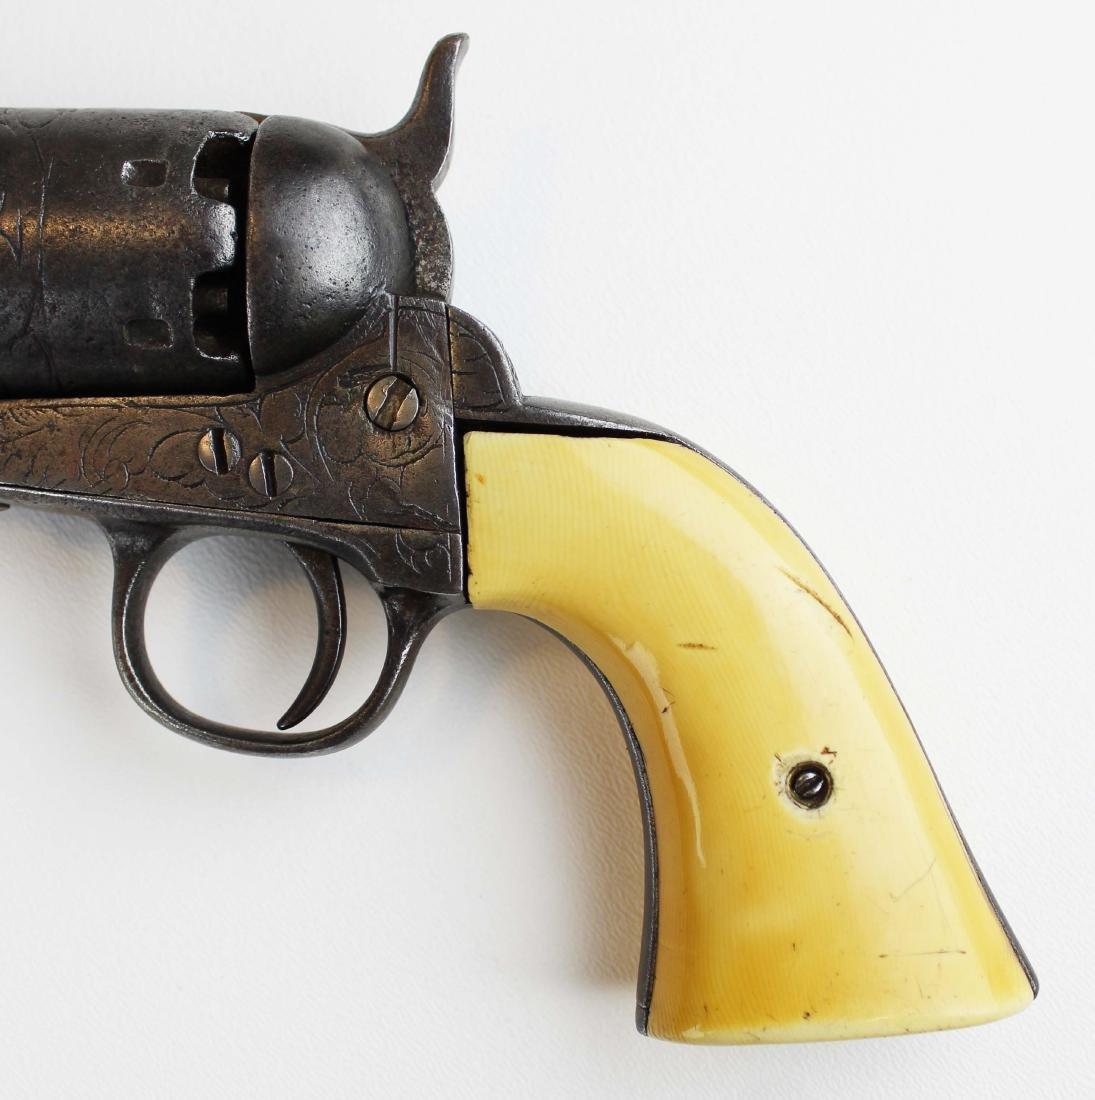 Colt 1851 Navy percussion revolver - 4